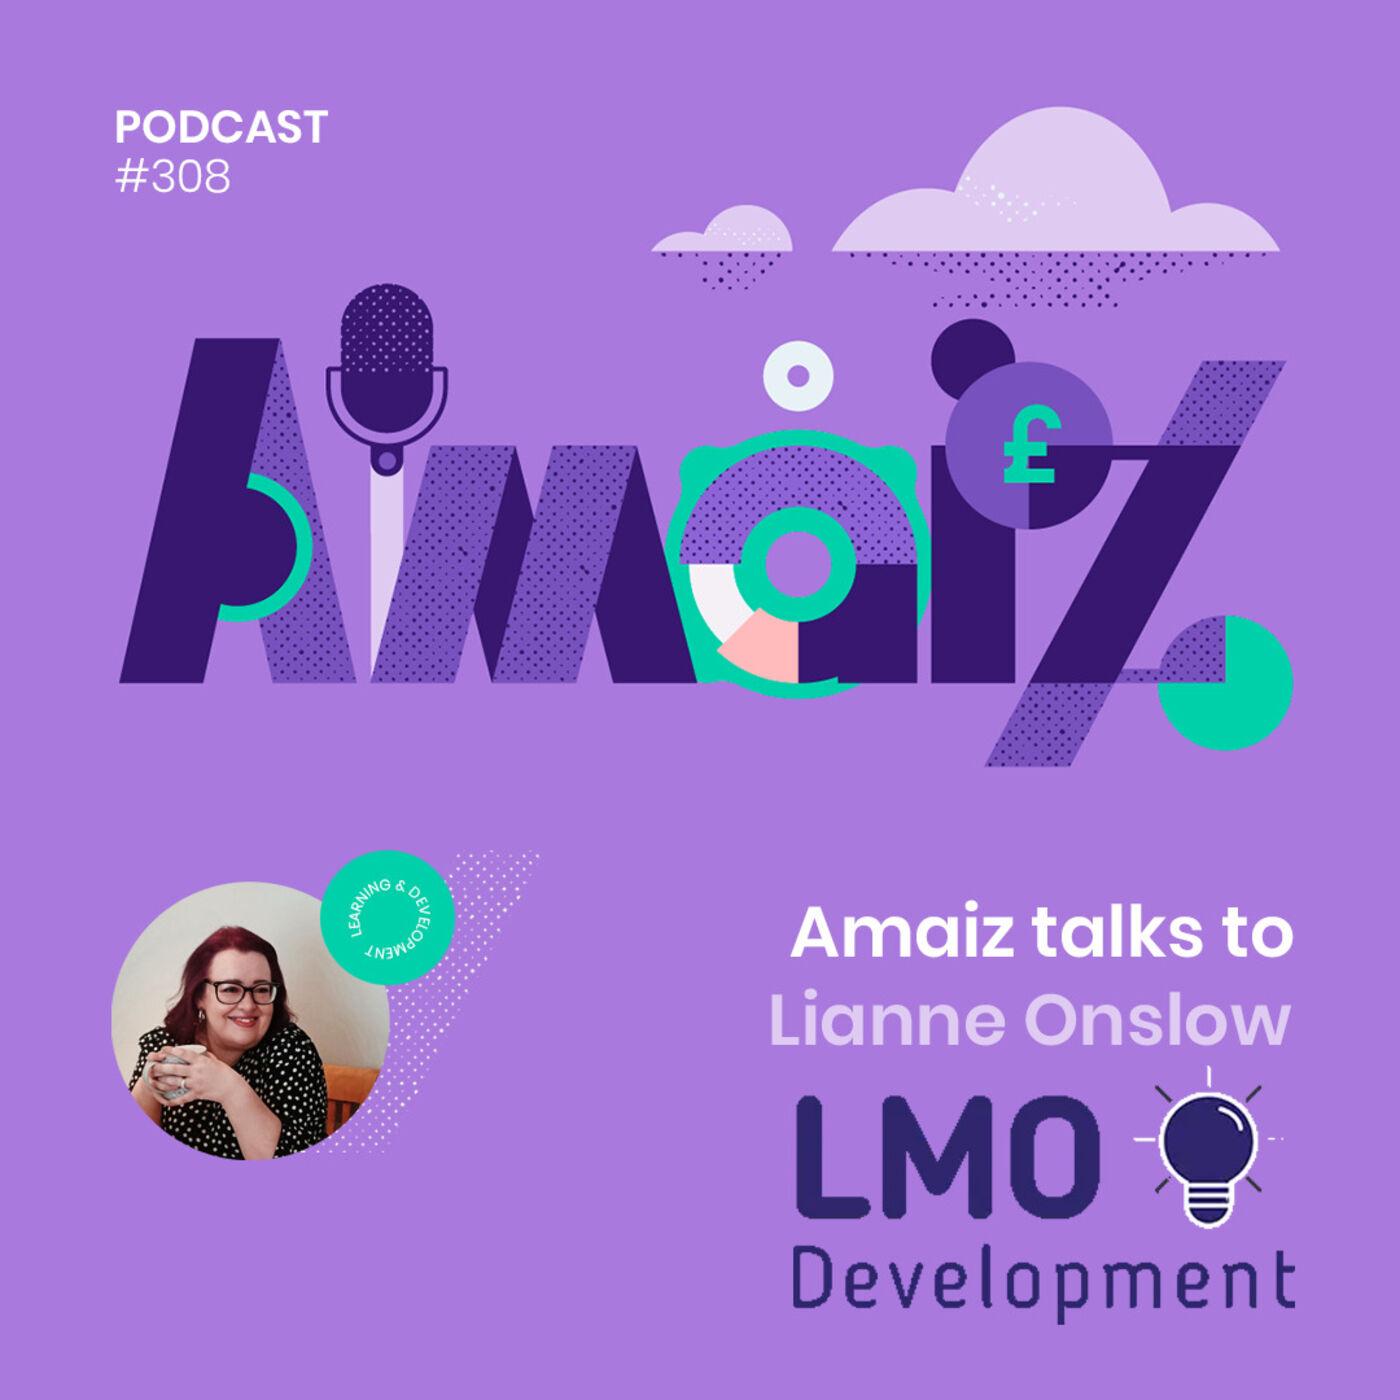 Business under Lockdown - Amaiz talks to Lianne Onslow of LMO Development